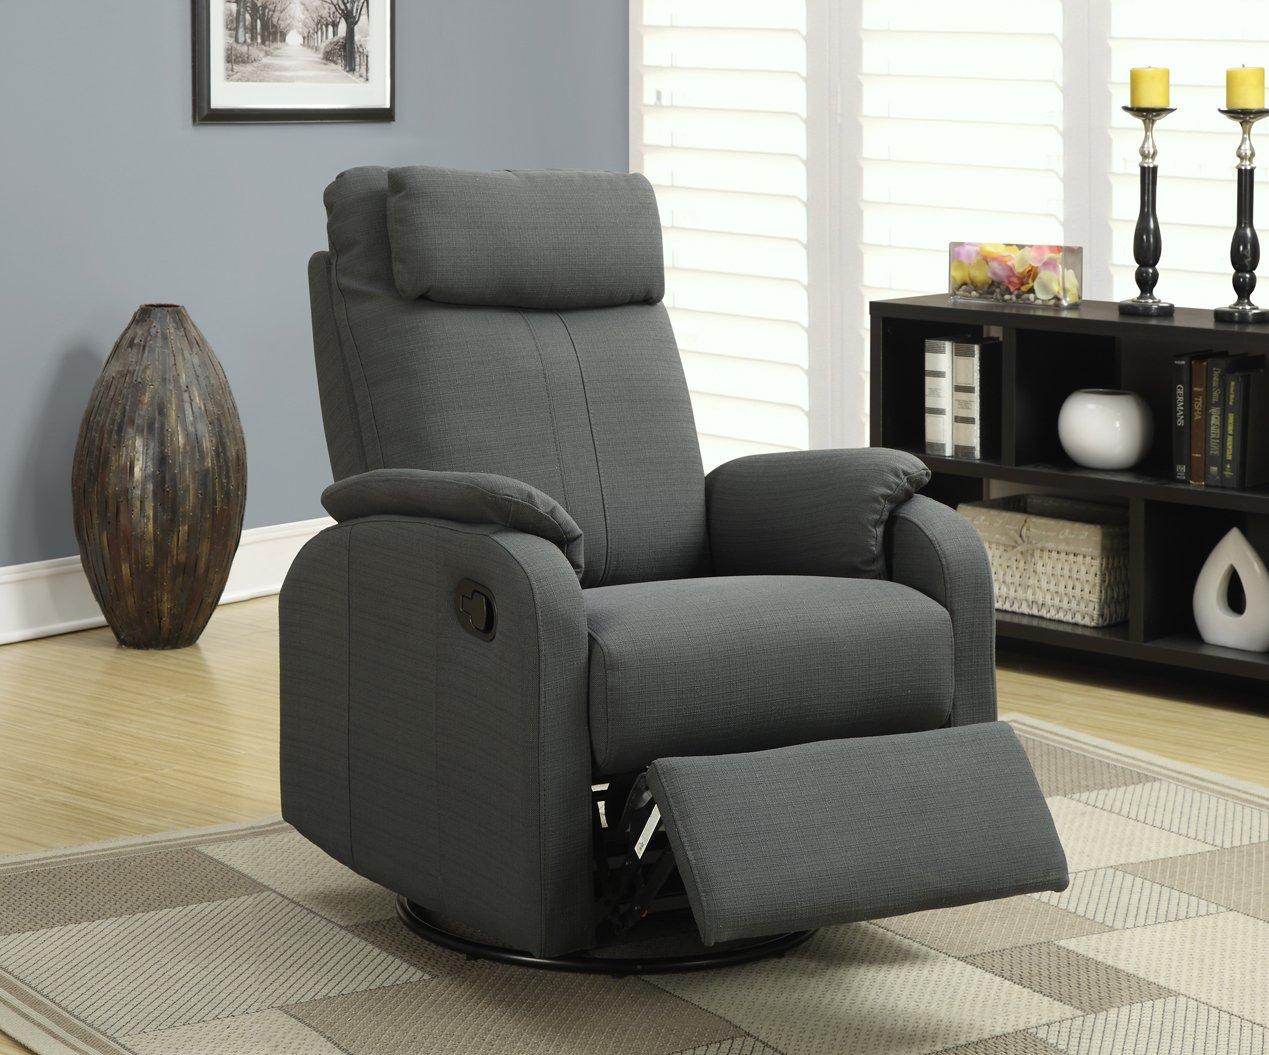 Amazon com monarch specialties charcoal grey linen fabric swivel rocker recliner kitchen dining